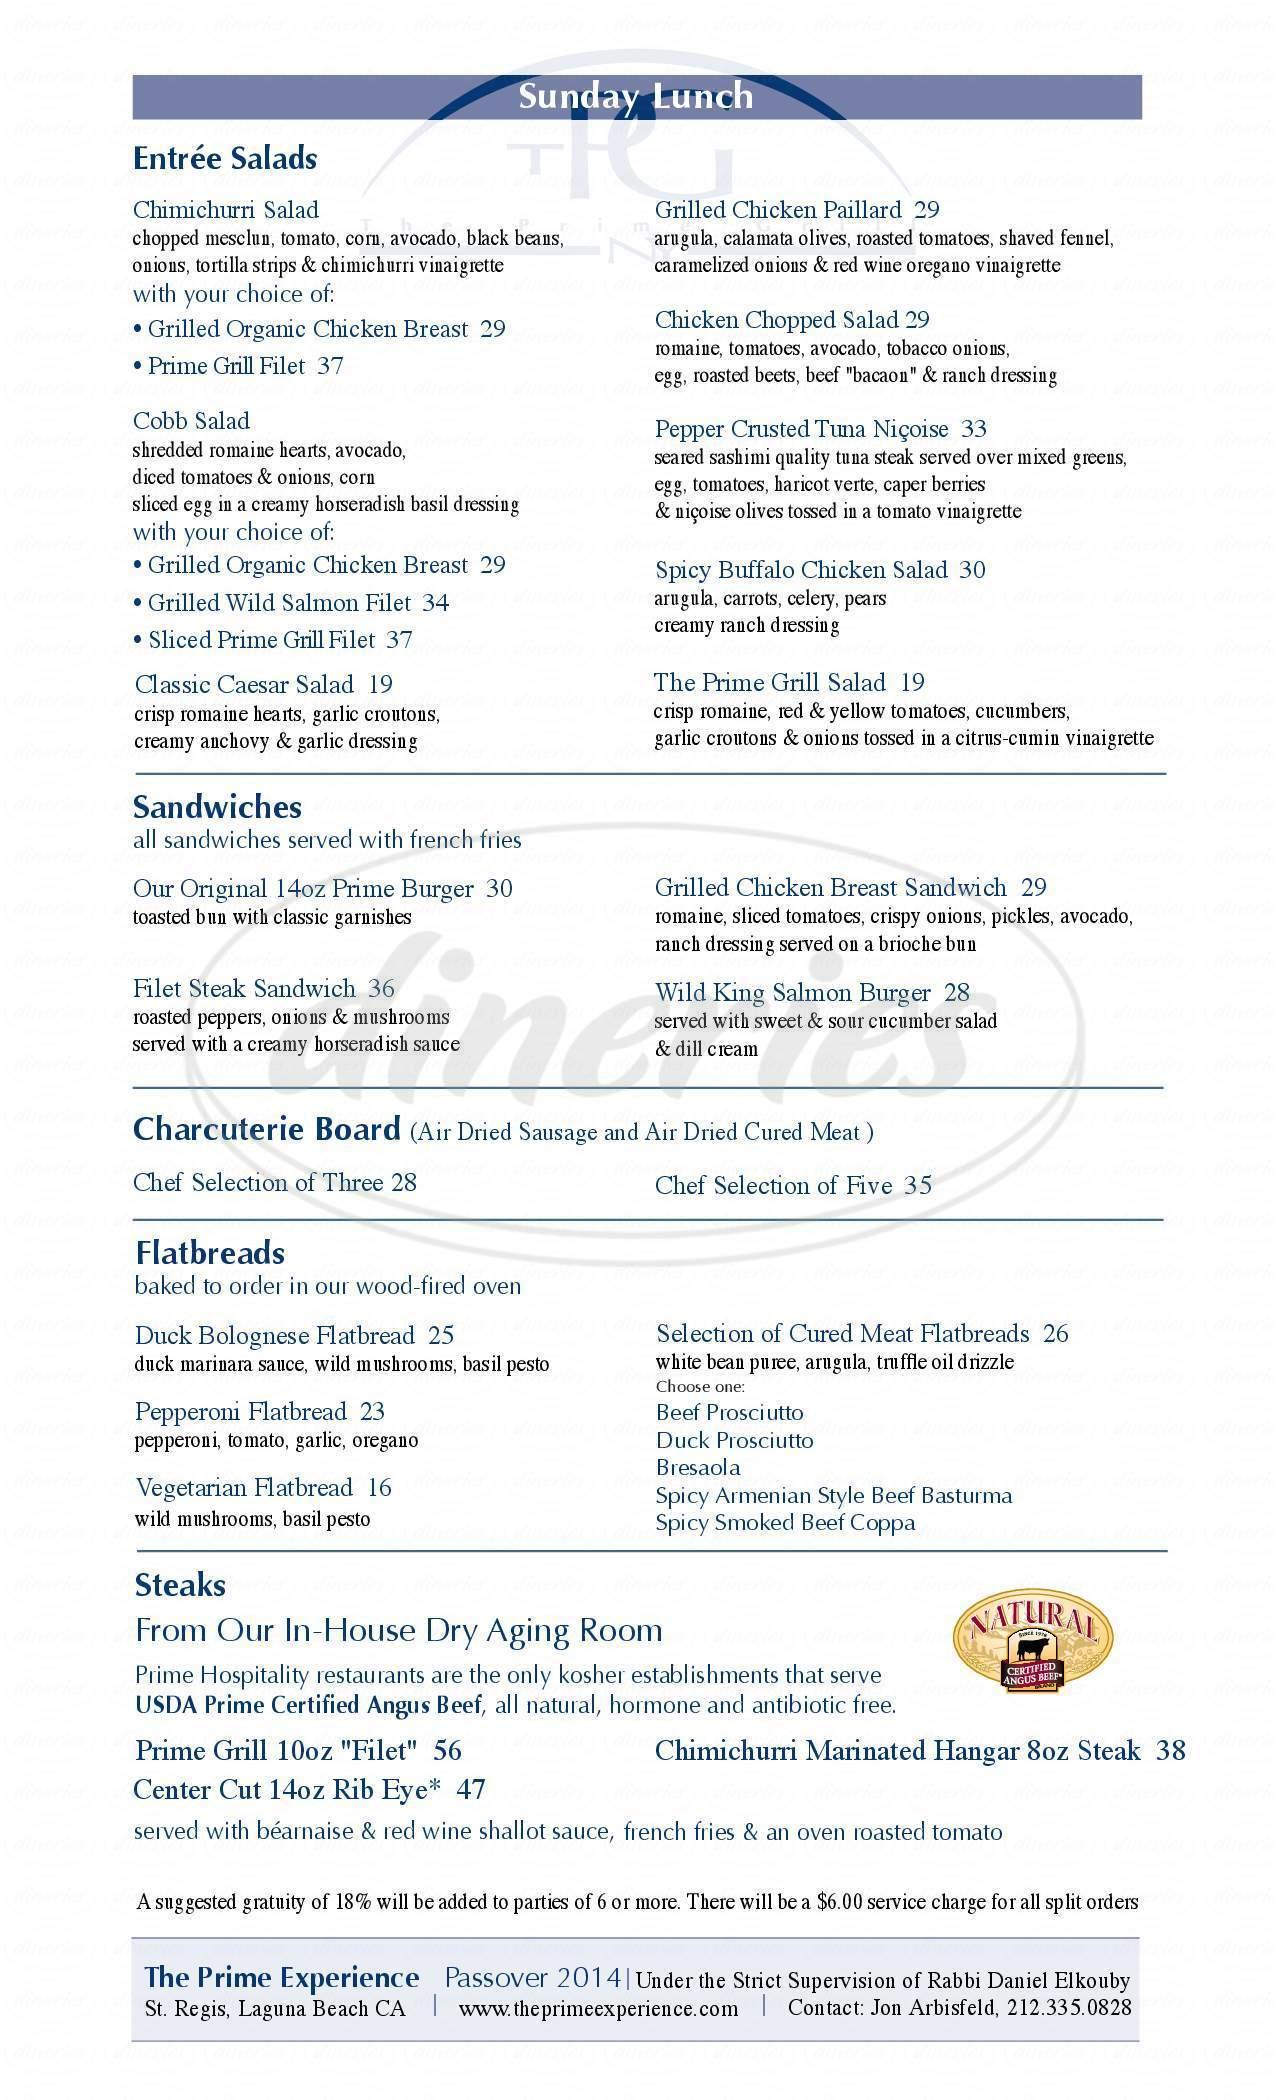 menu for Prime Grill